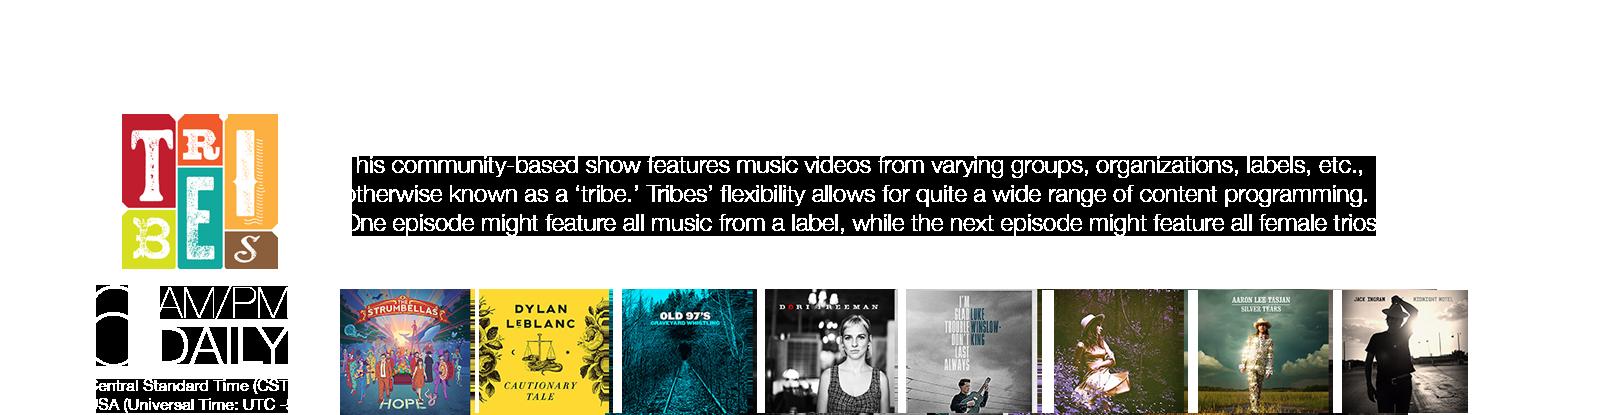 HomePageSlide-Tribes6